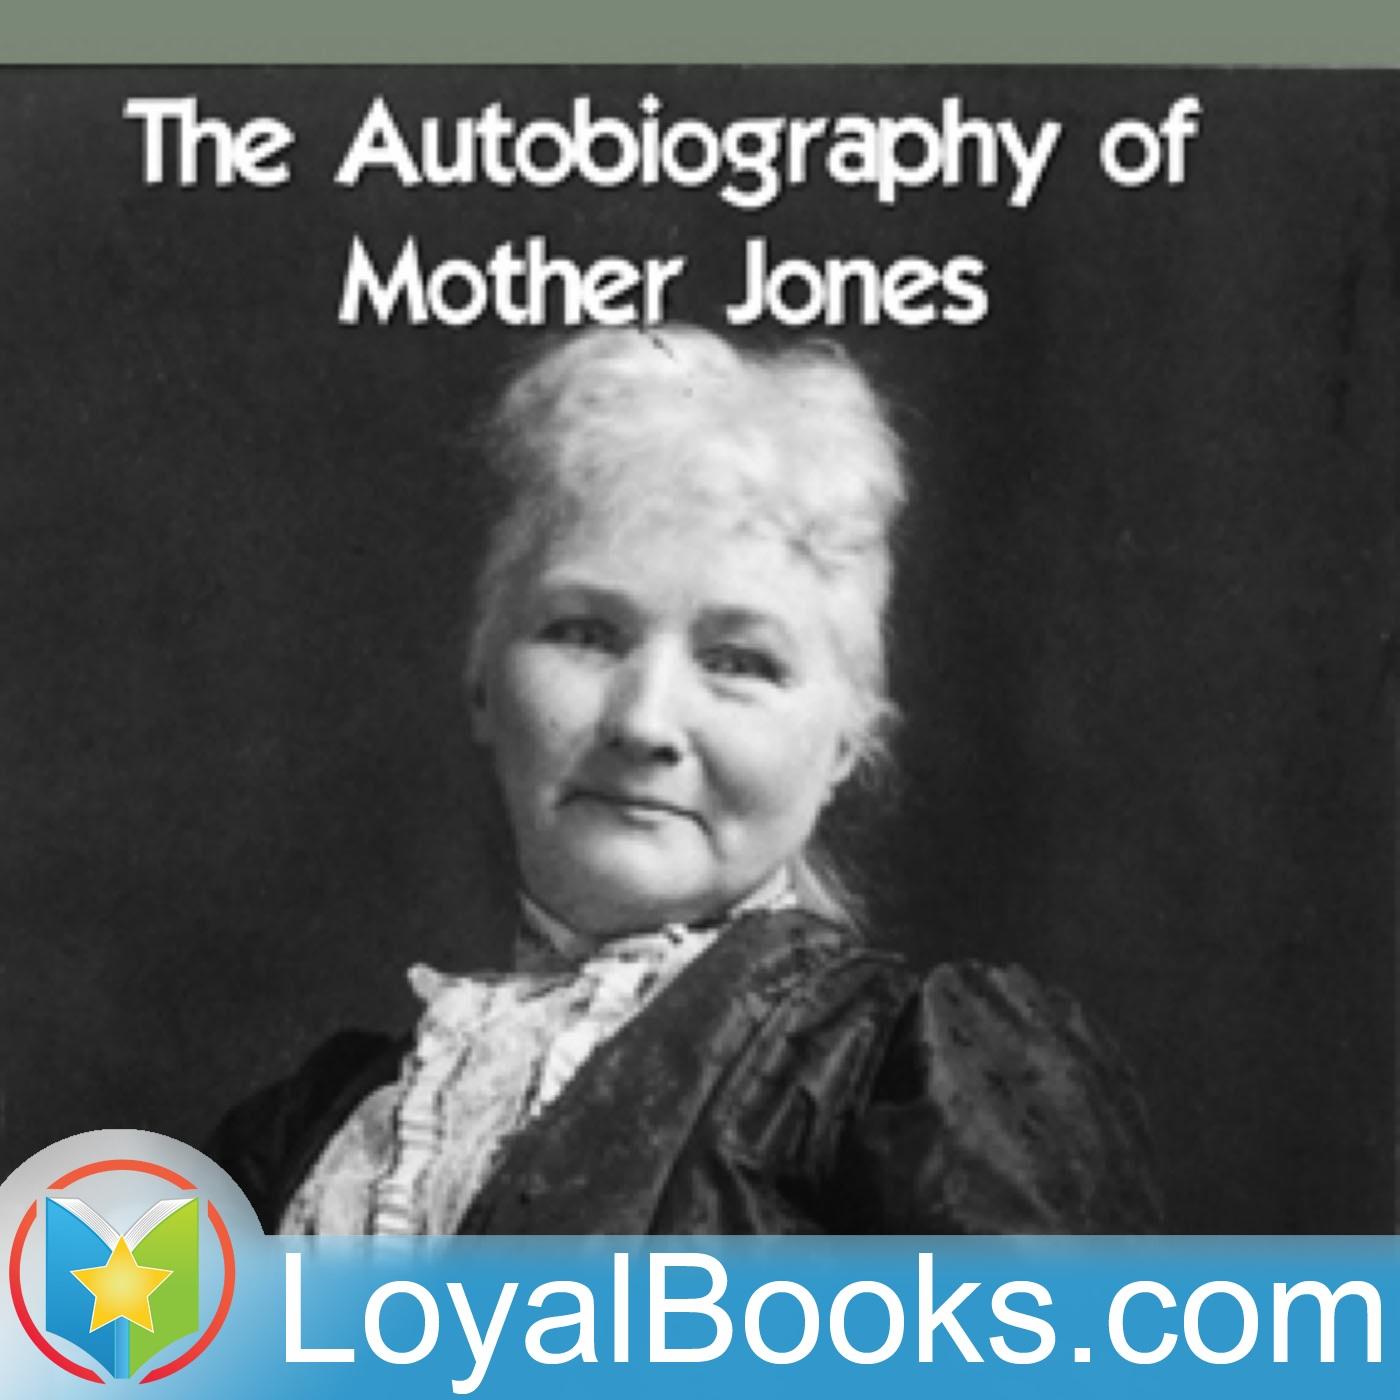 The Autobiography of Mother Jones by Mary Harris Jones  